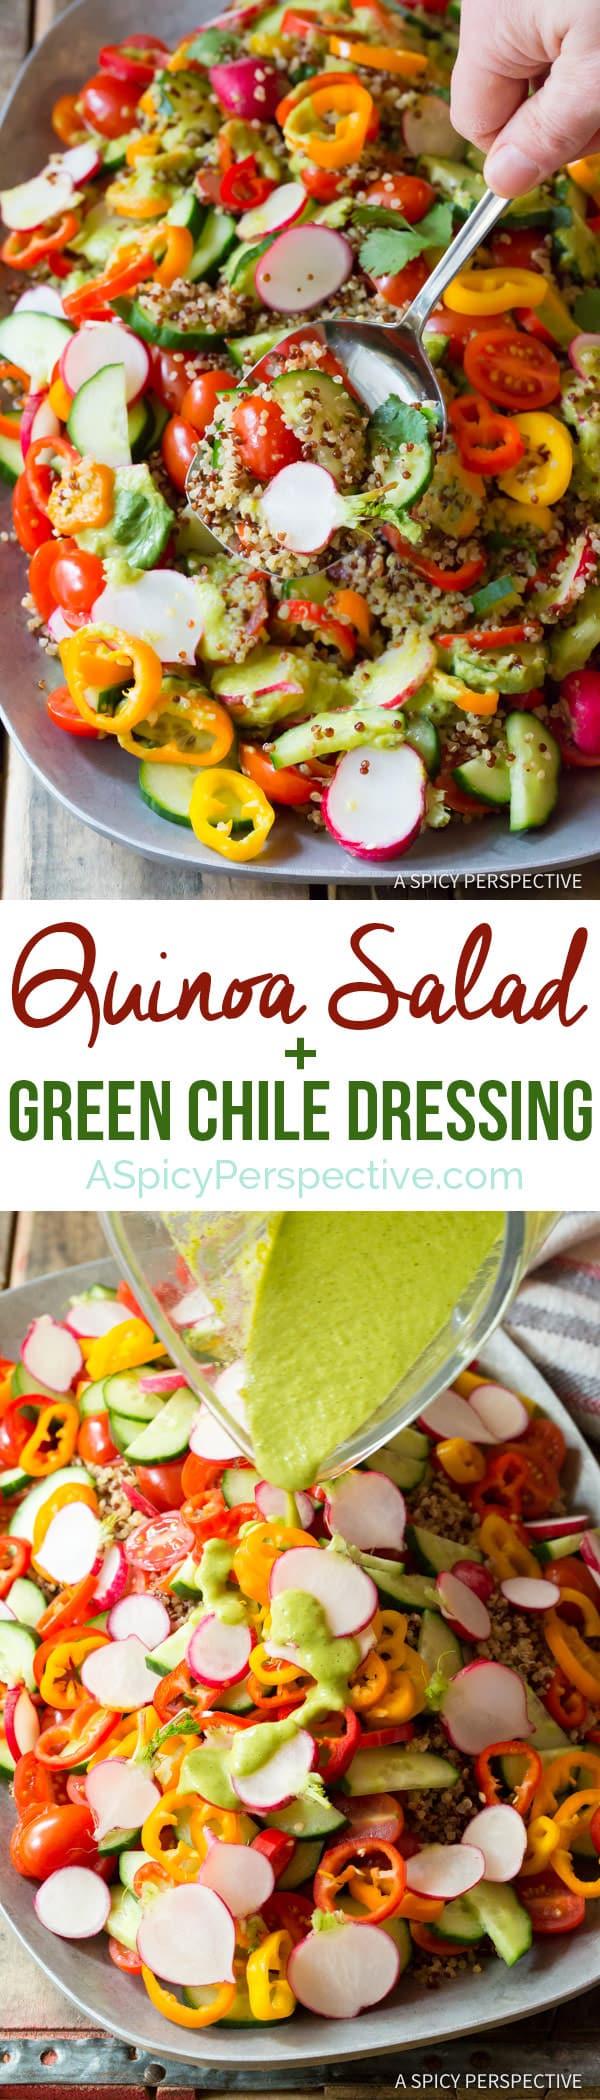 Hearty Quinoa Salad Recipe with Green Chile Dressing (Vegan & Gluten Free!) | ASpicyPerspective.com